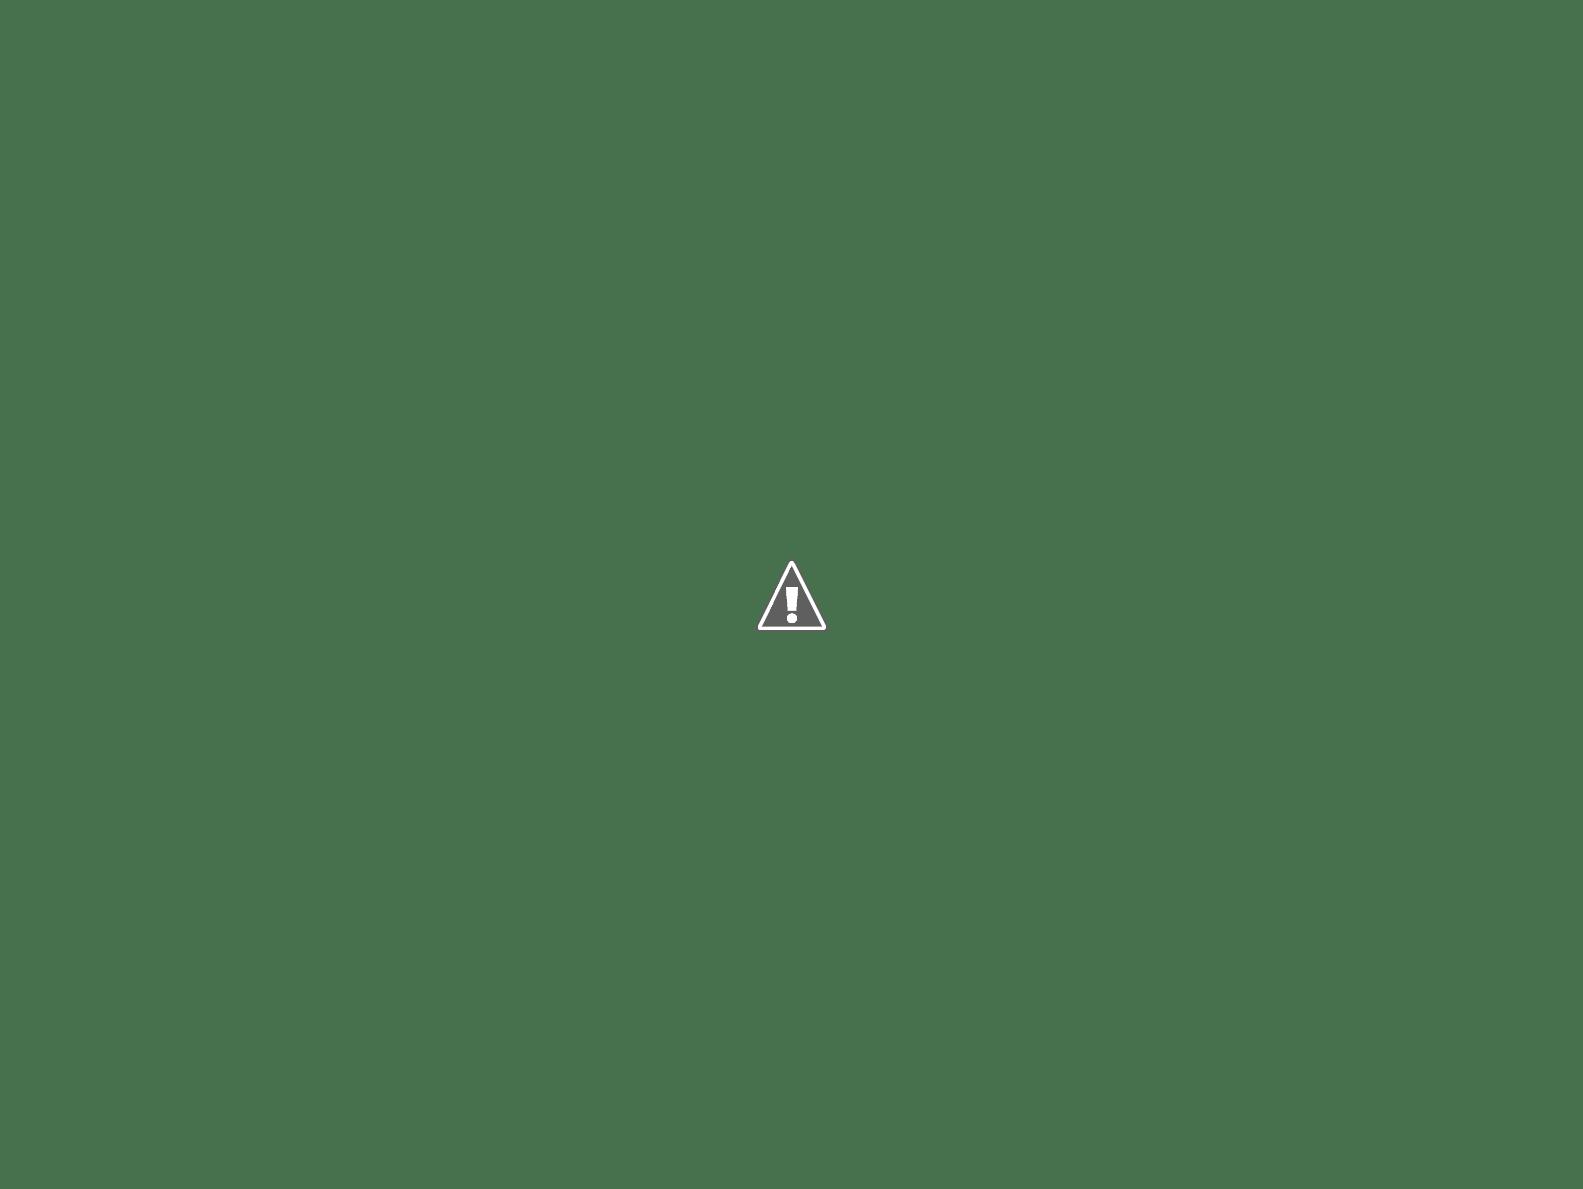 diplomas para editar - Ideal.vistalist.co